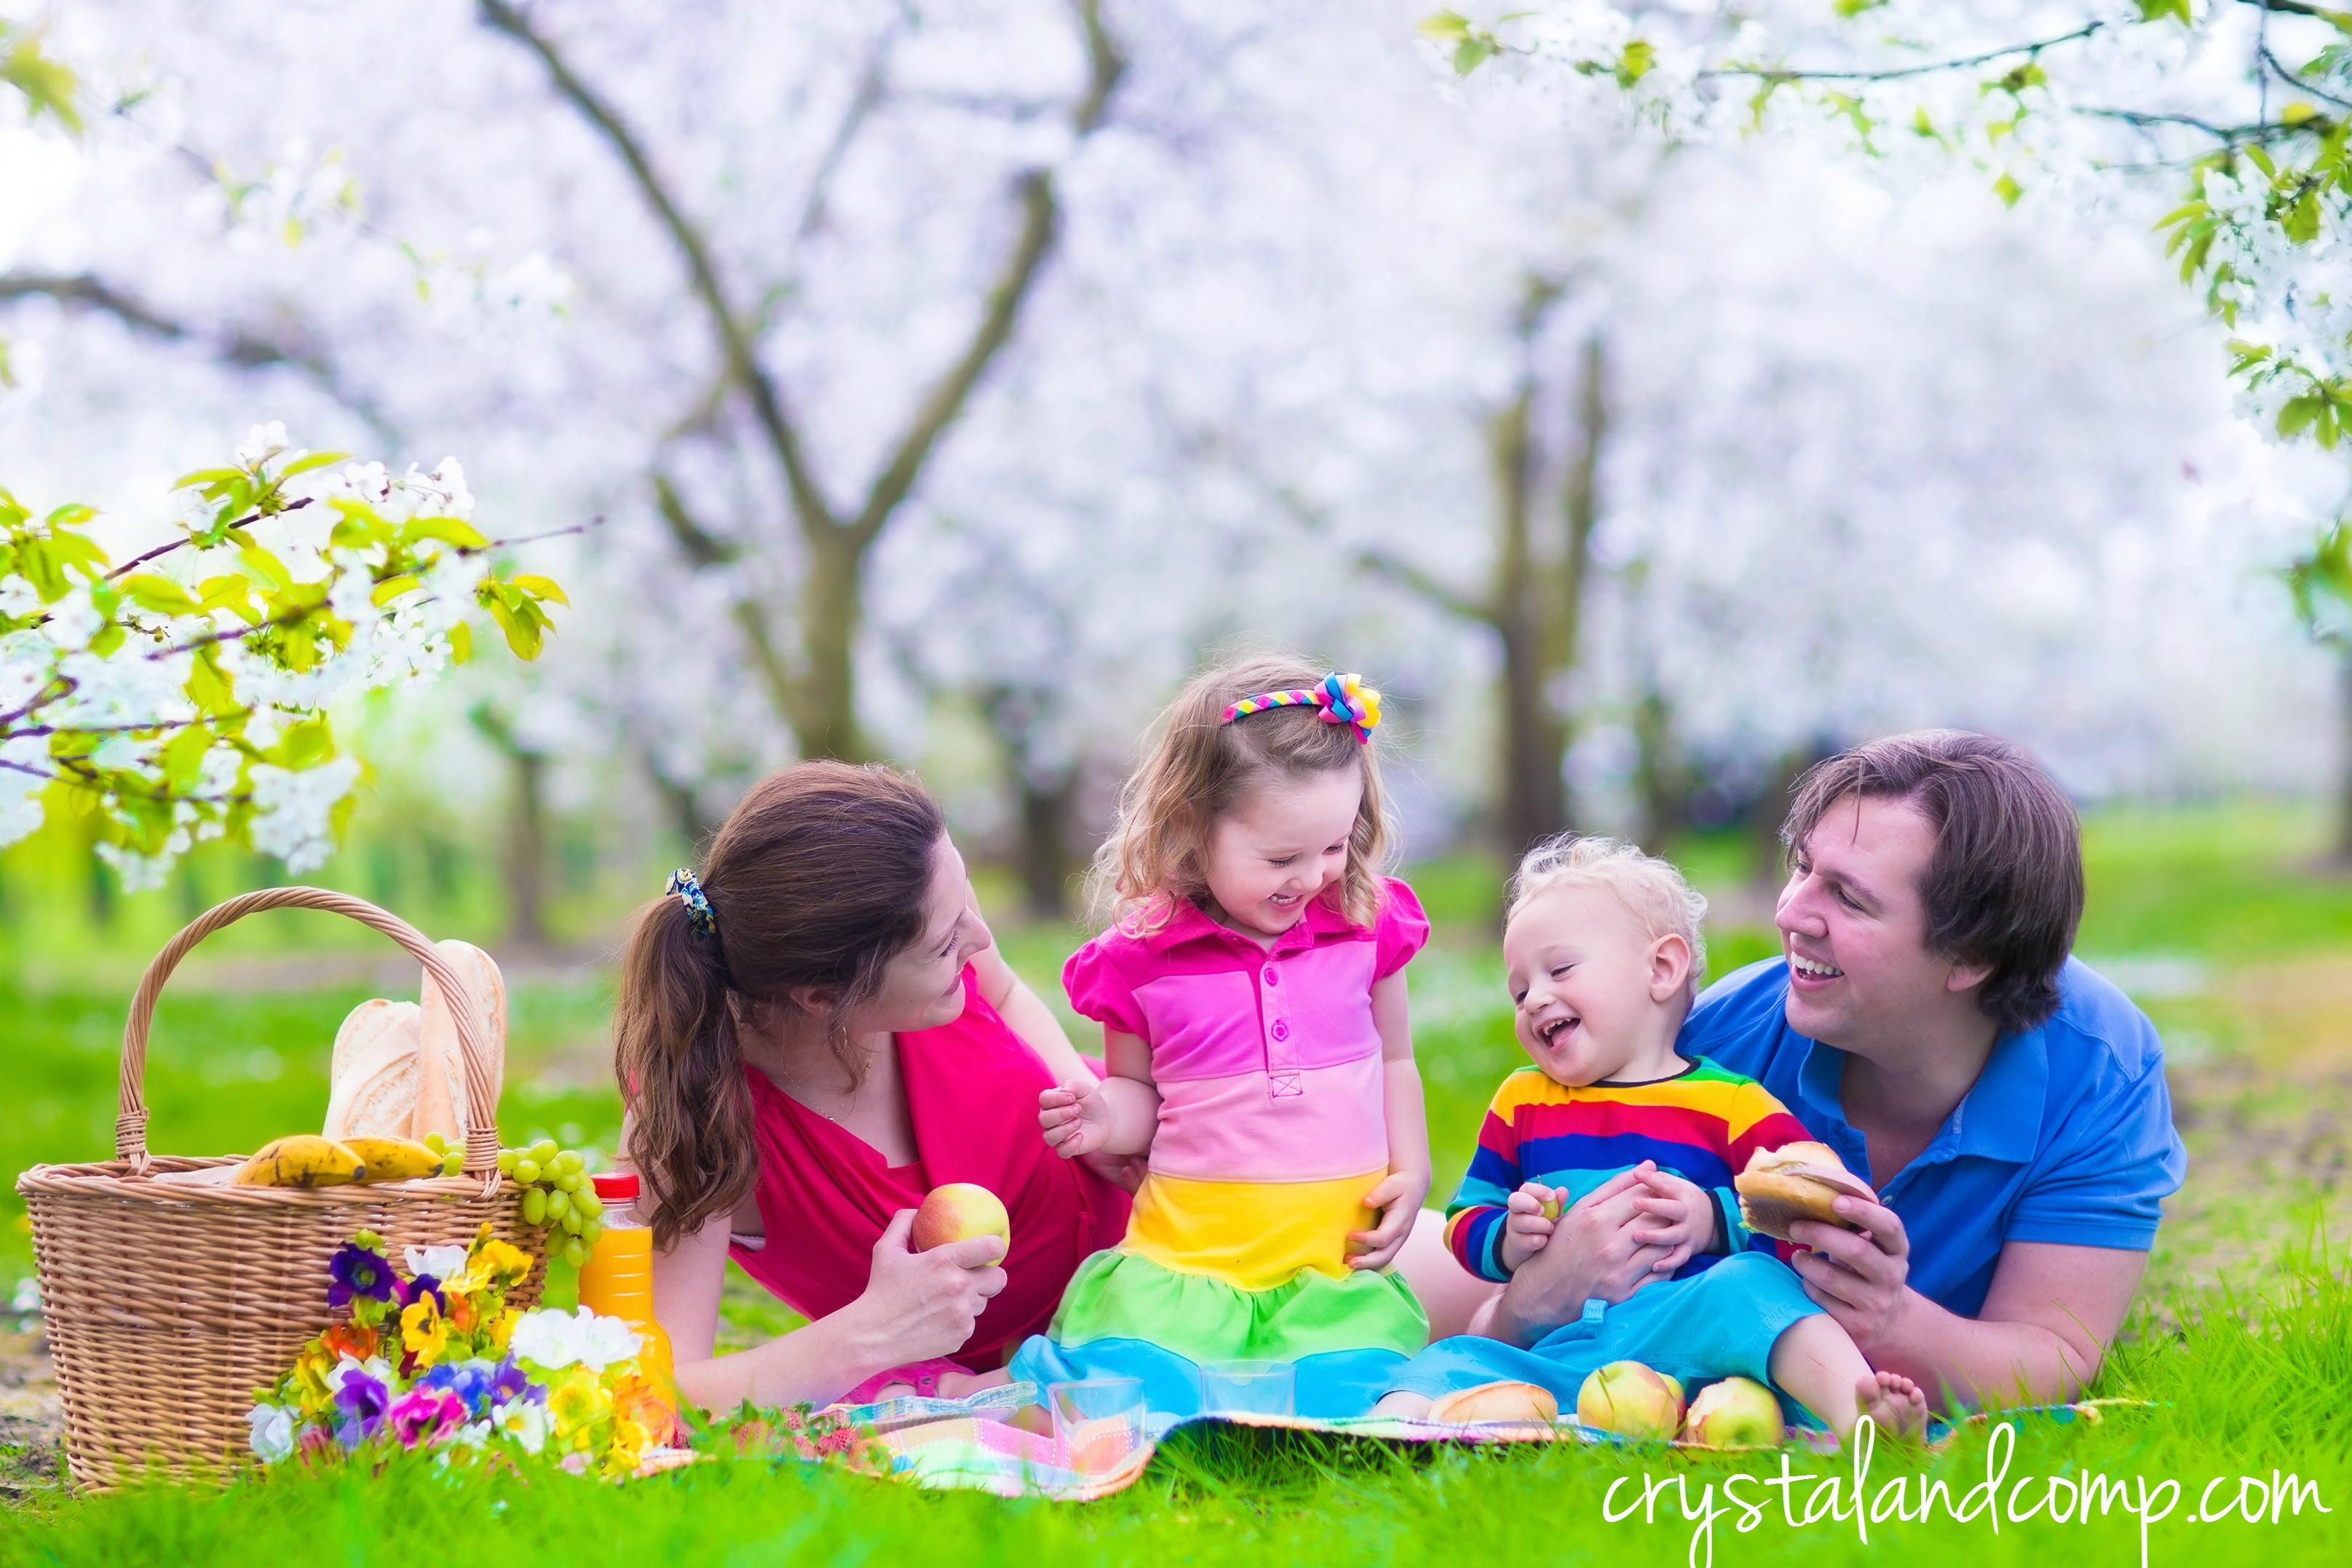 25 Family Picnic Ideas You Will Love | CrystalandComp.com